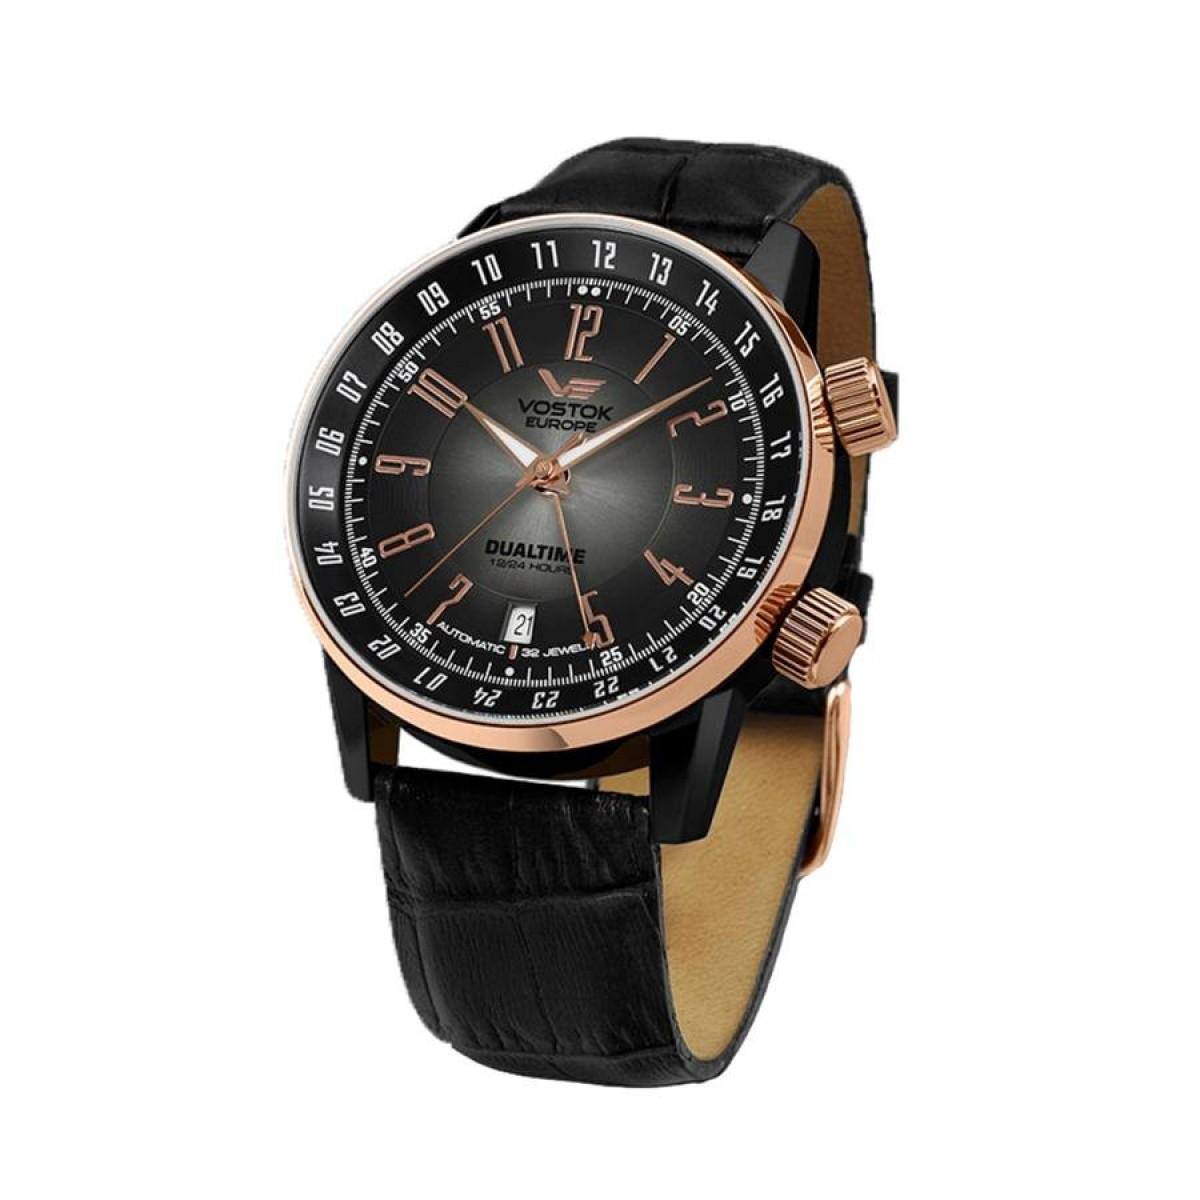 Часовник Vostok Europe 2426-5603061